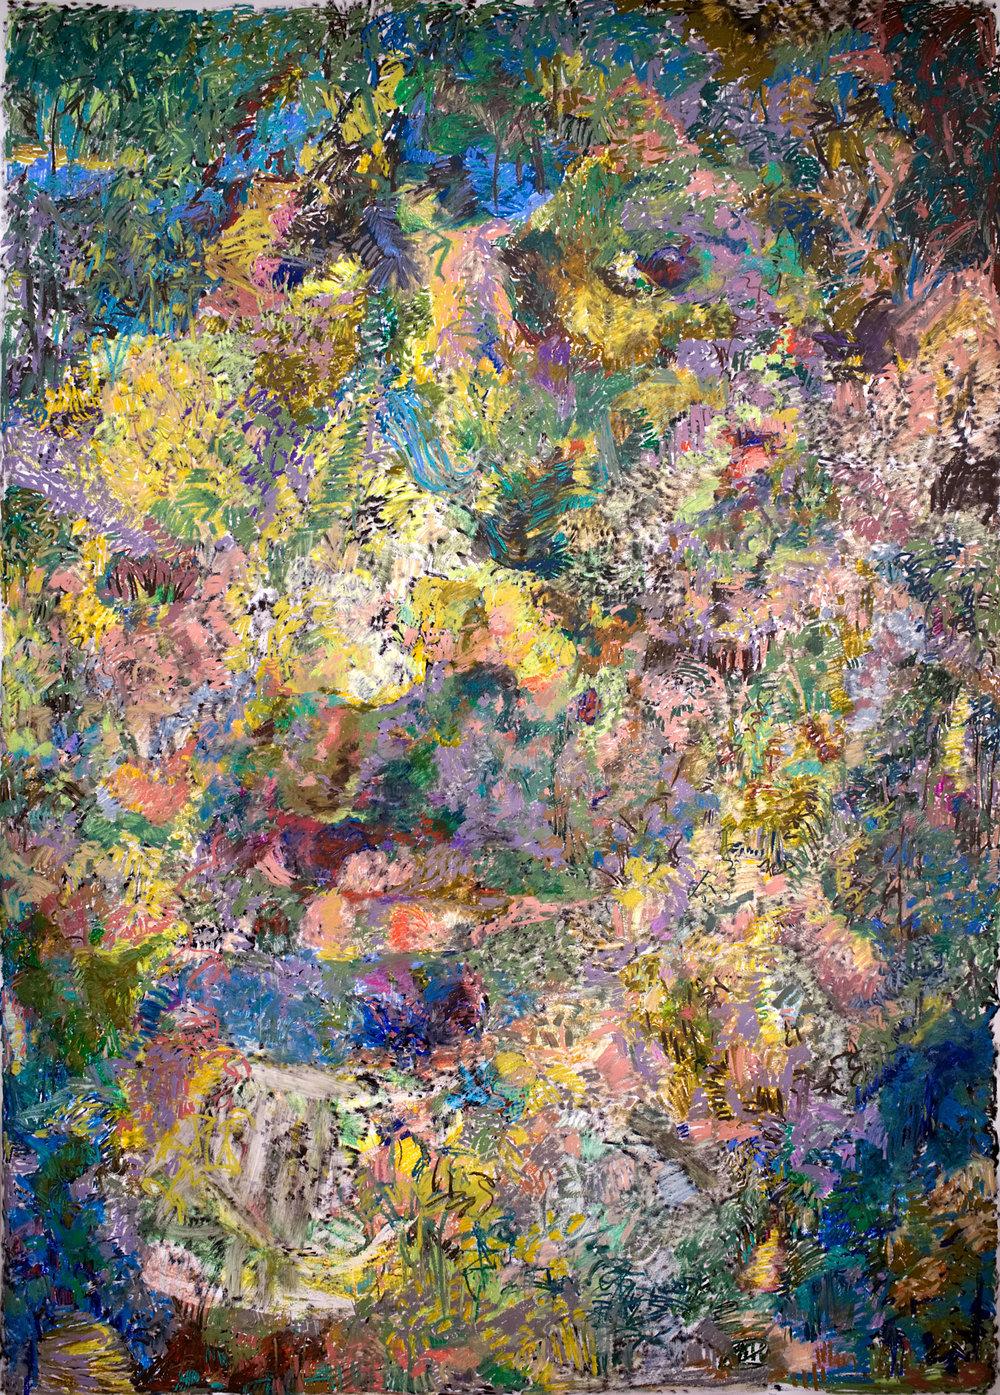 """Connoisseur of Chaos""  2017-2018, Oil Pastel and Acrylic on Yupo Paper, 60"" x 86""   A self-portrait landscape"